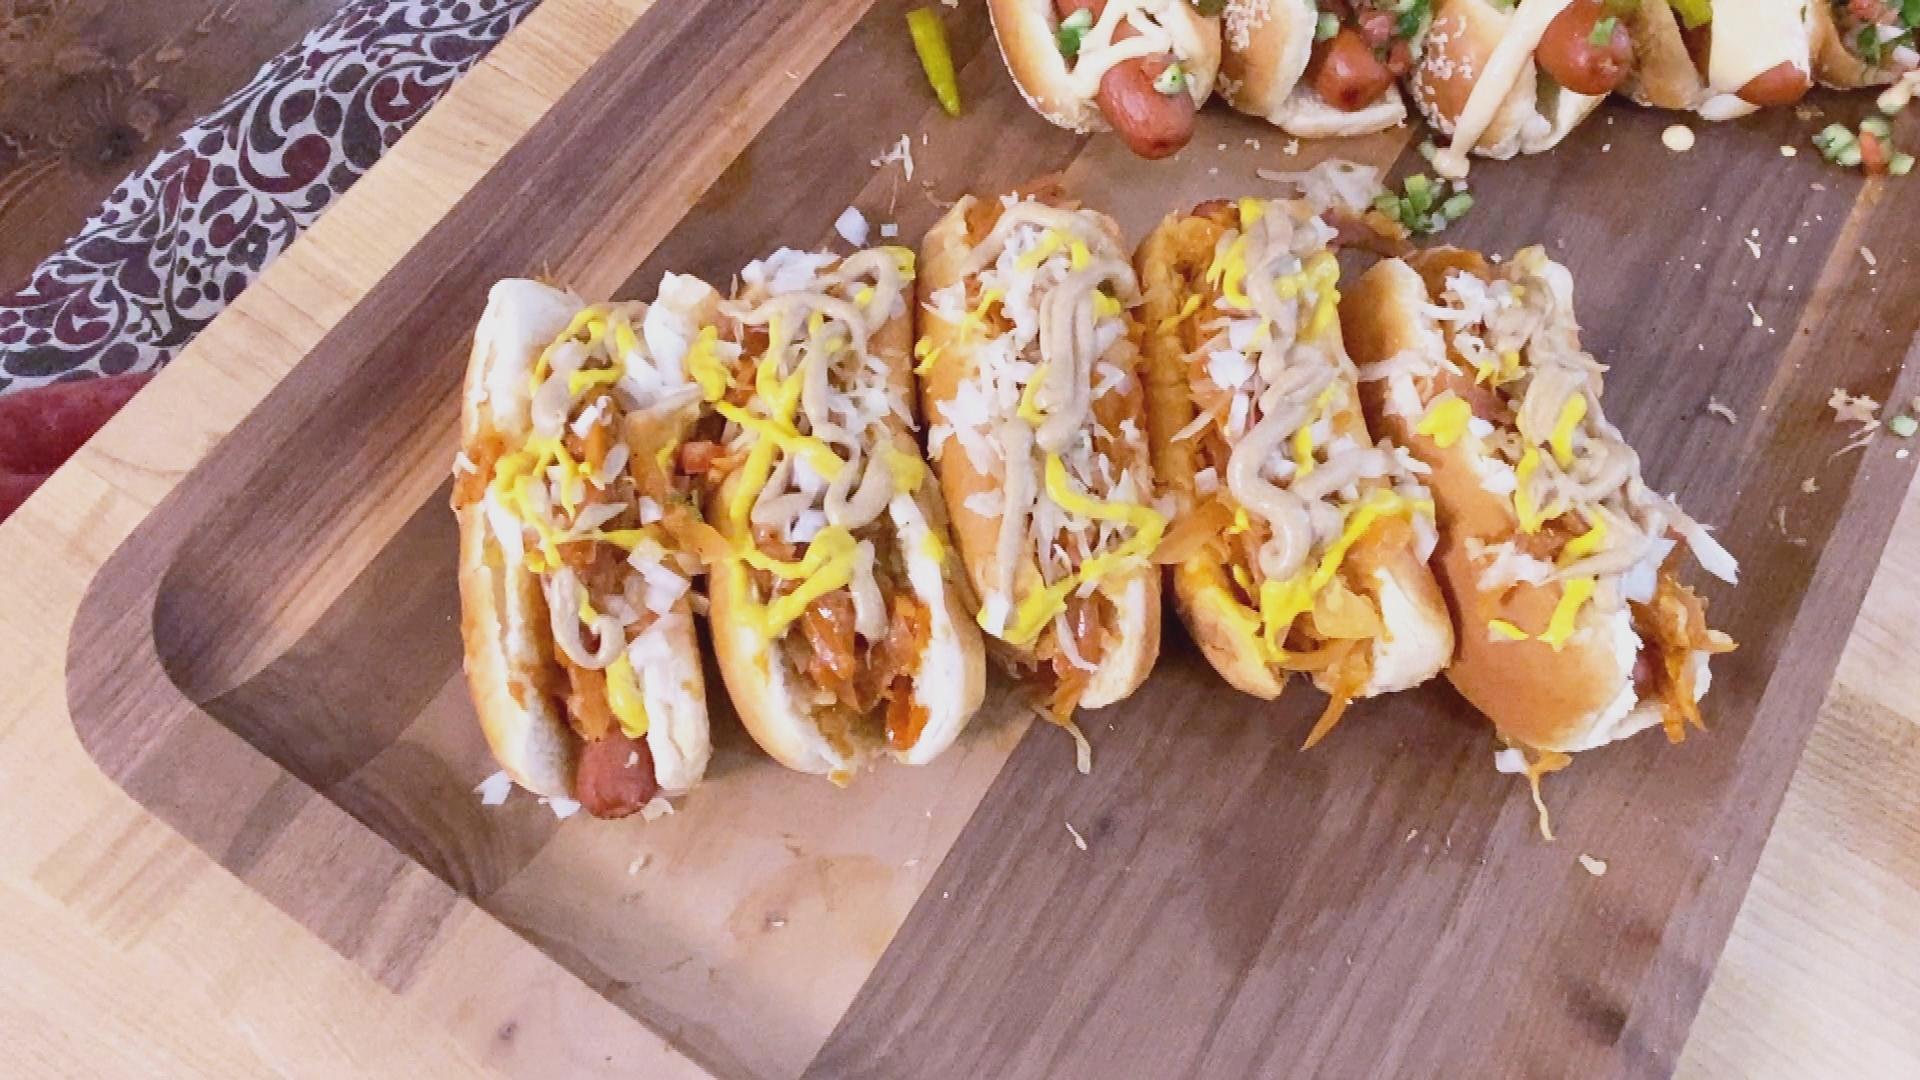 NYC Dogs With Sabrett's-Style Onion Sauce + Sauerkraut